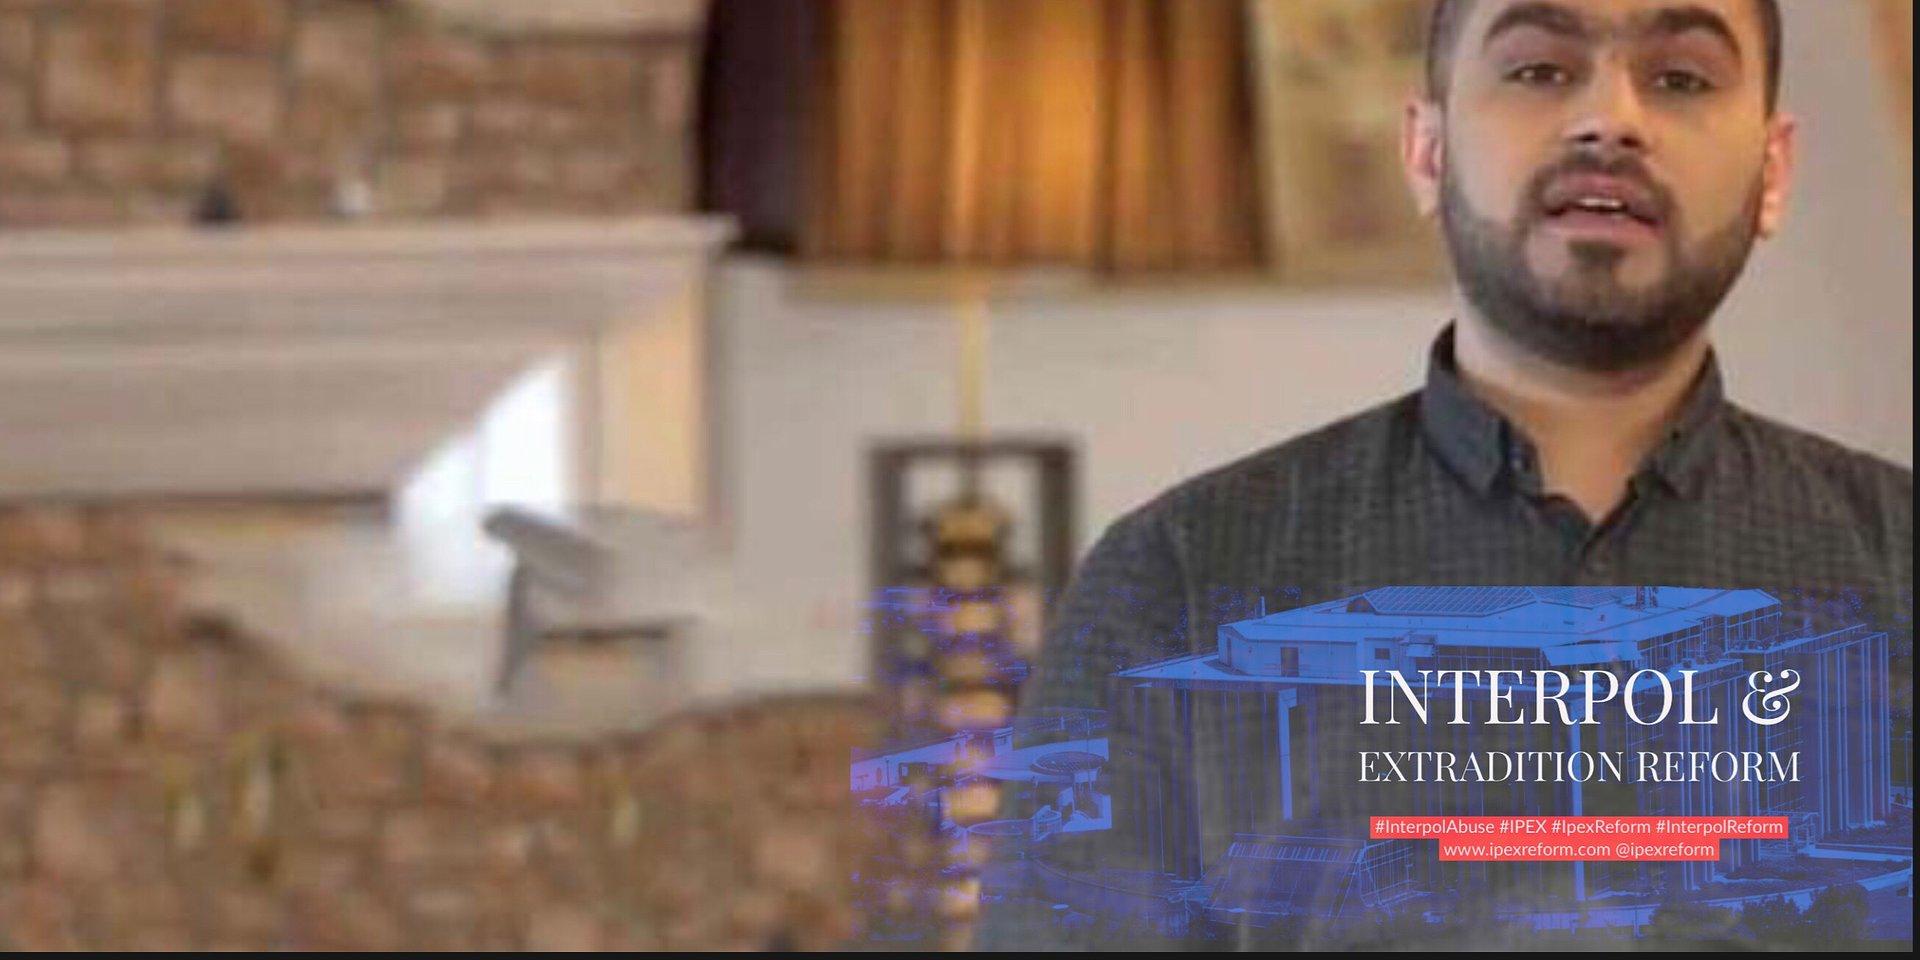 Interpol's role in Saudi's extradition of Osama al-Hasani